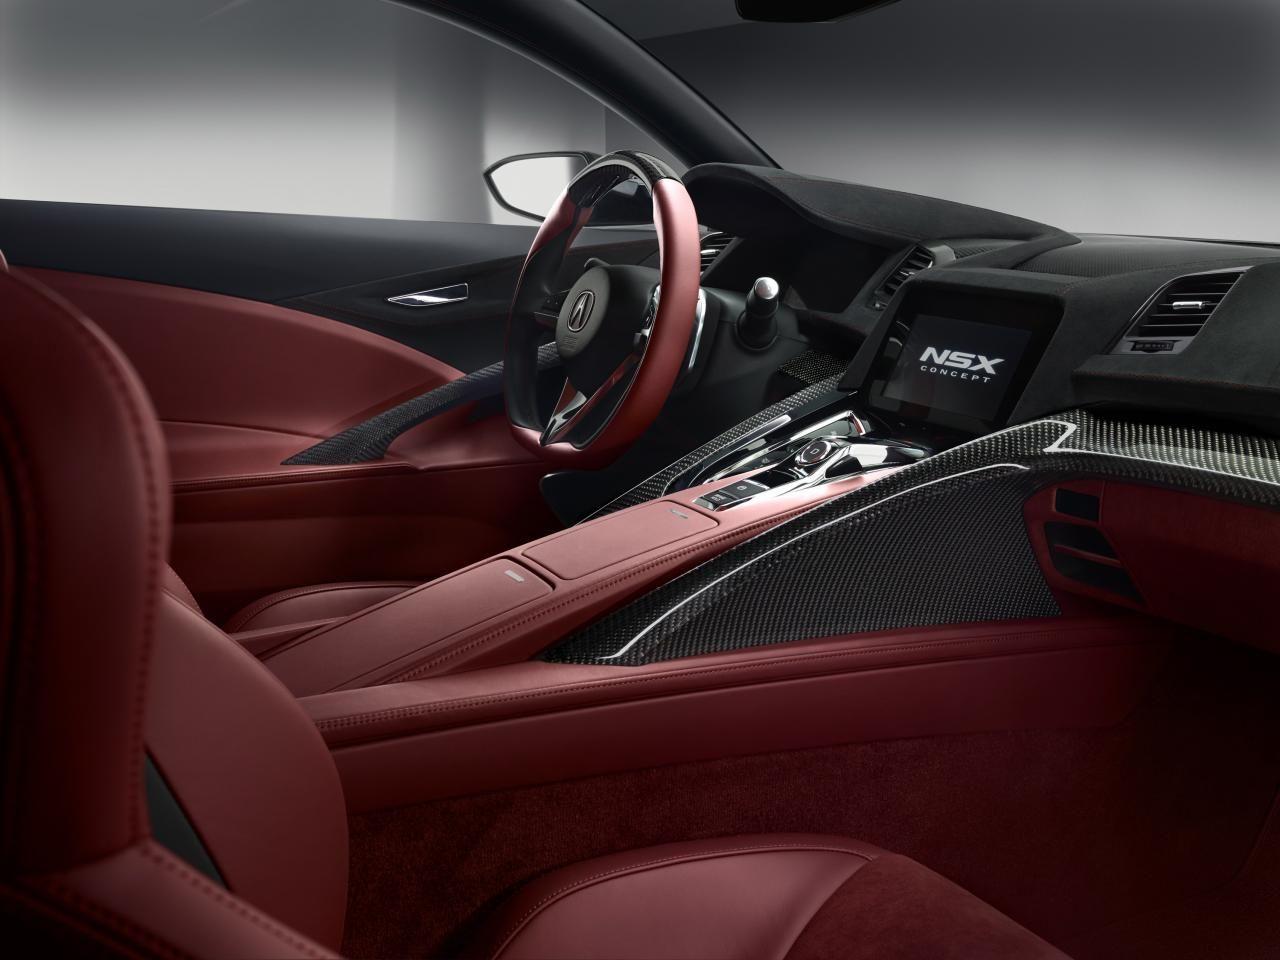 2013 acura nsx concept galleries pinterest acura nsx cars 2013 acura nsx concept voltagebd Gallery